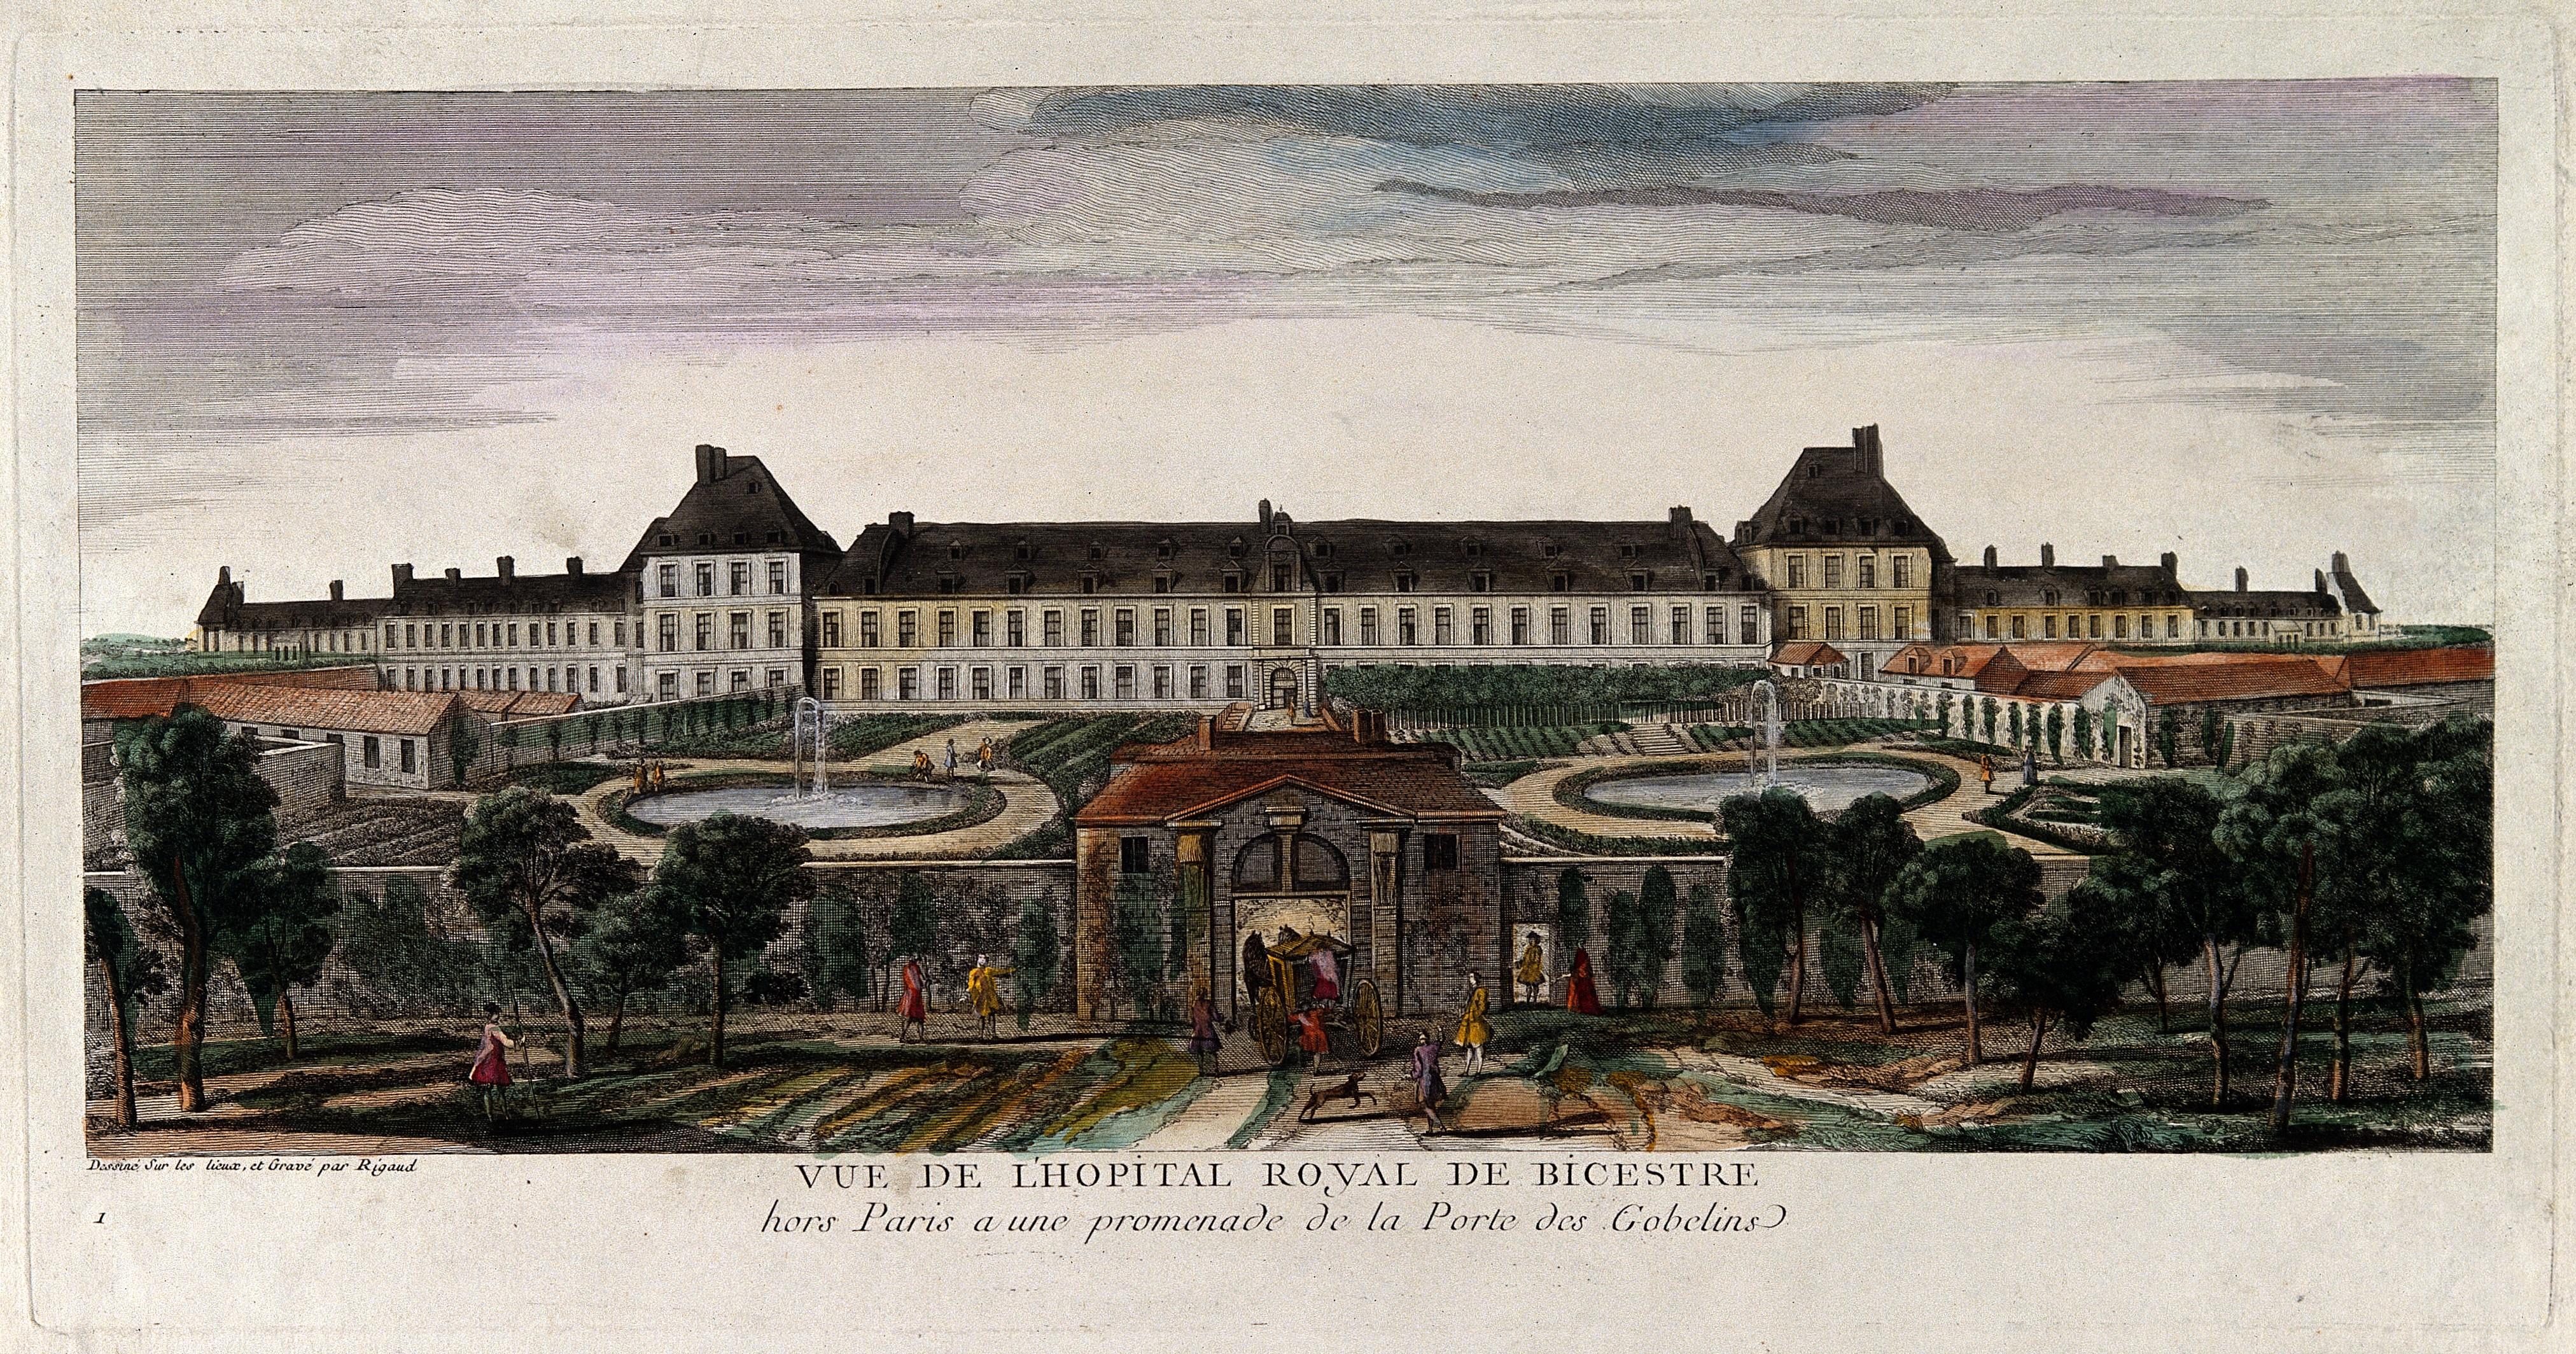 https://upload.wikimedia.org/wikipedia/commons/9/9d/H%C3%B4pital_Royal_de_Bic%C3%AAtre%2C_Paris%3B_panoramic_view_with_gardens_Wellcome_V0014292.jpg